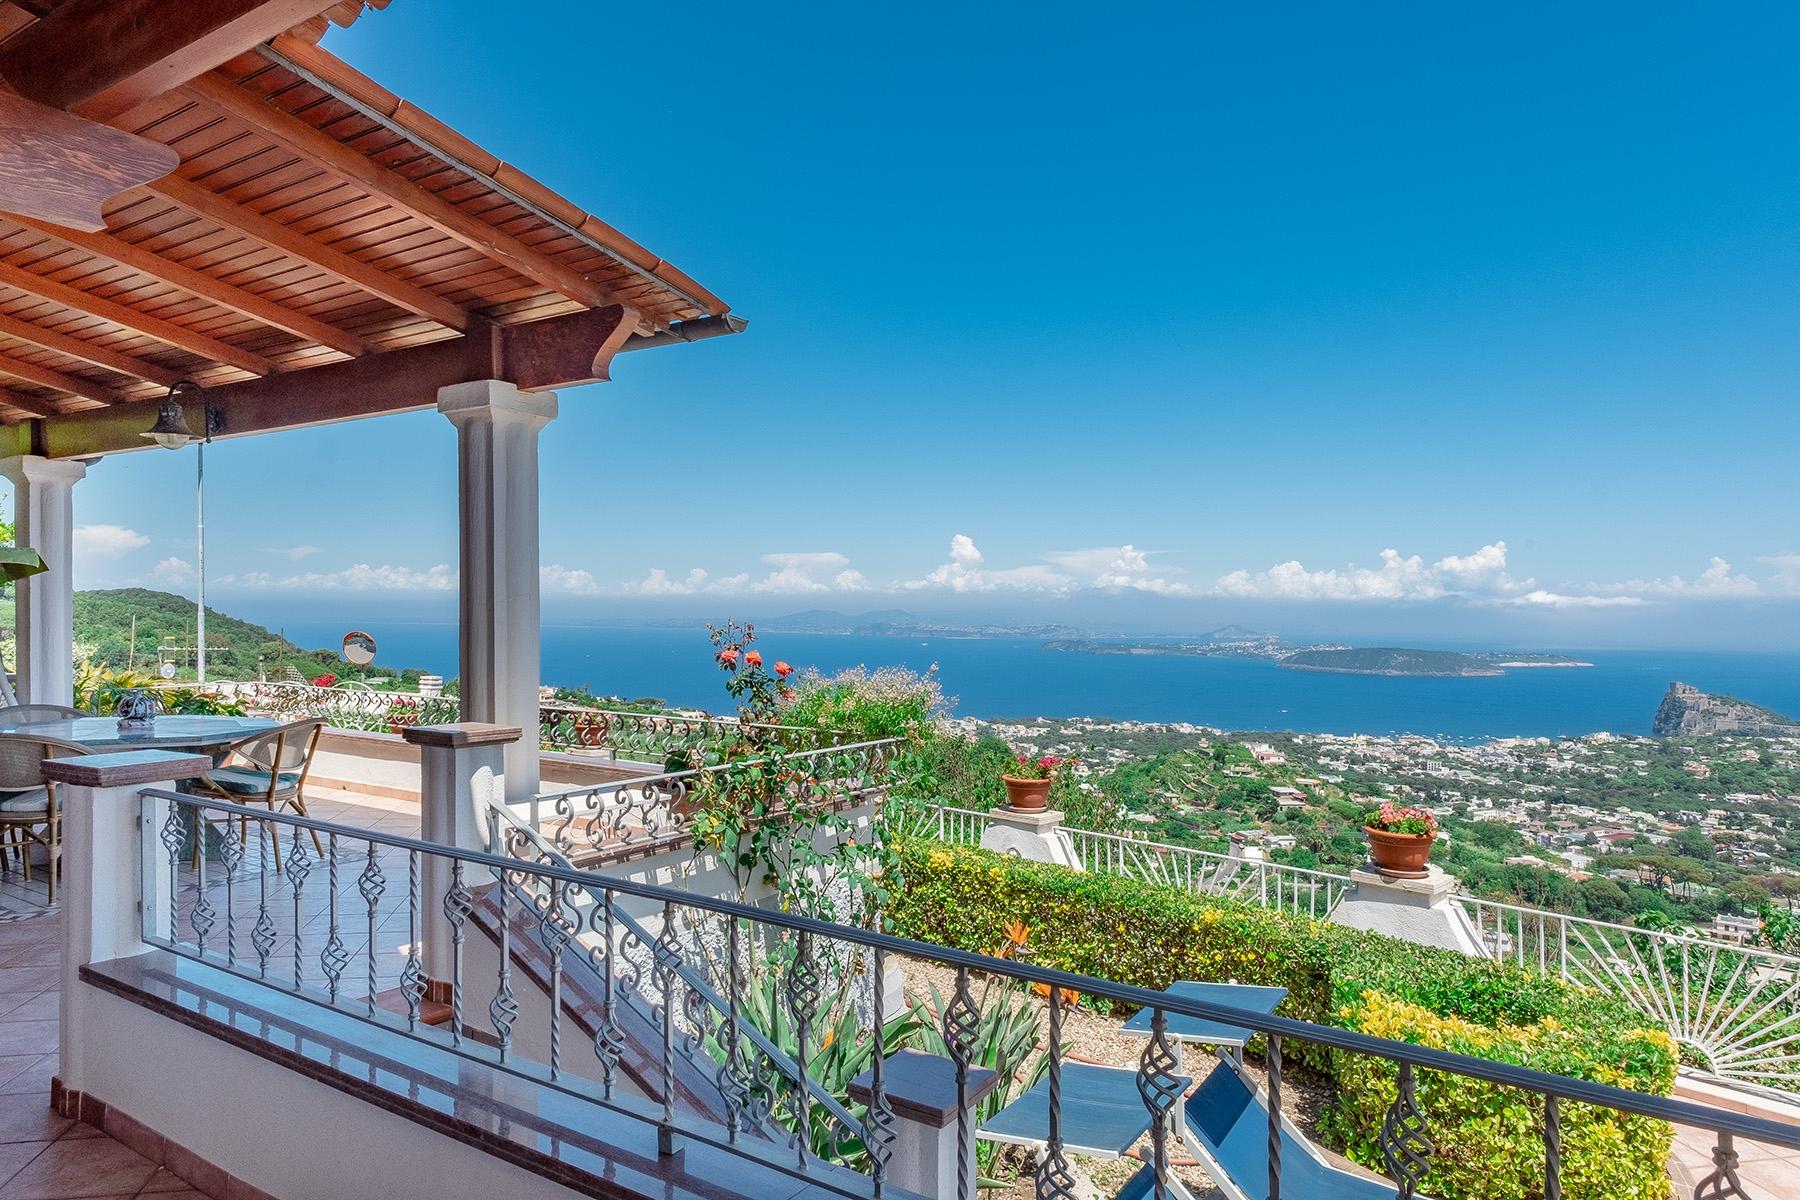 Villa in Vendita a Ischia: 5 locali, 138 mq - Foto 1